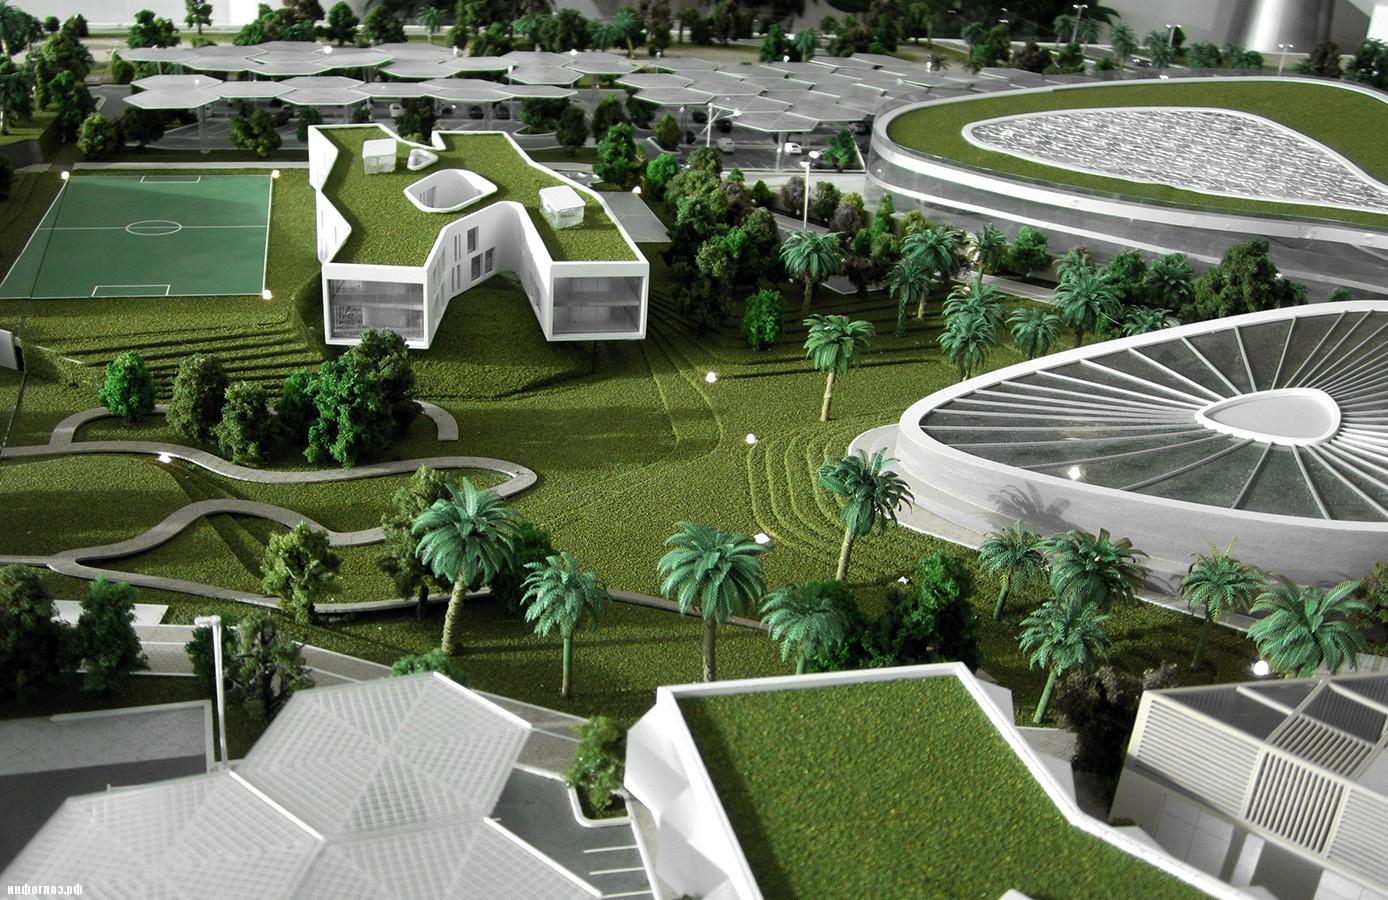 معماری پایدار معماری سبز - green architecture sustainable architecture